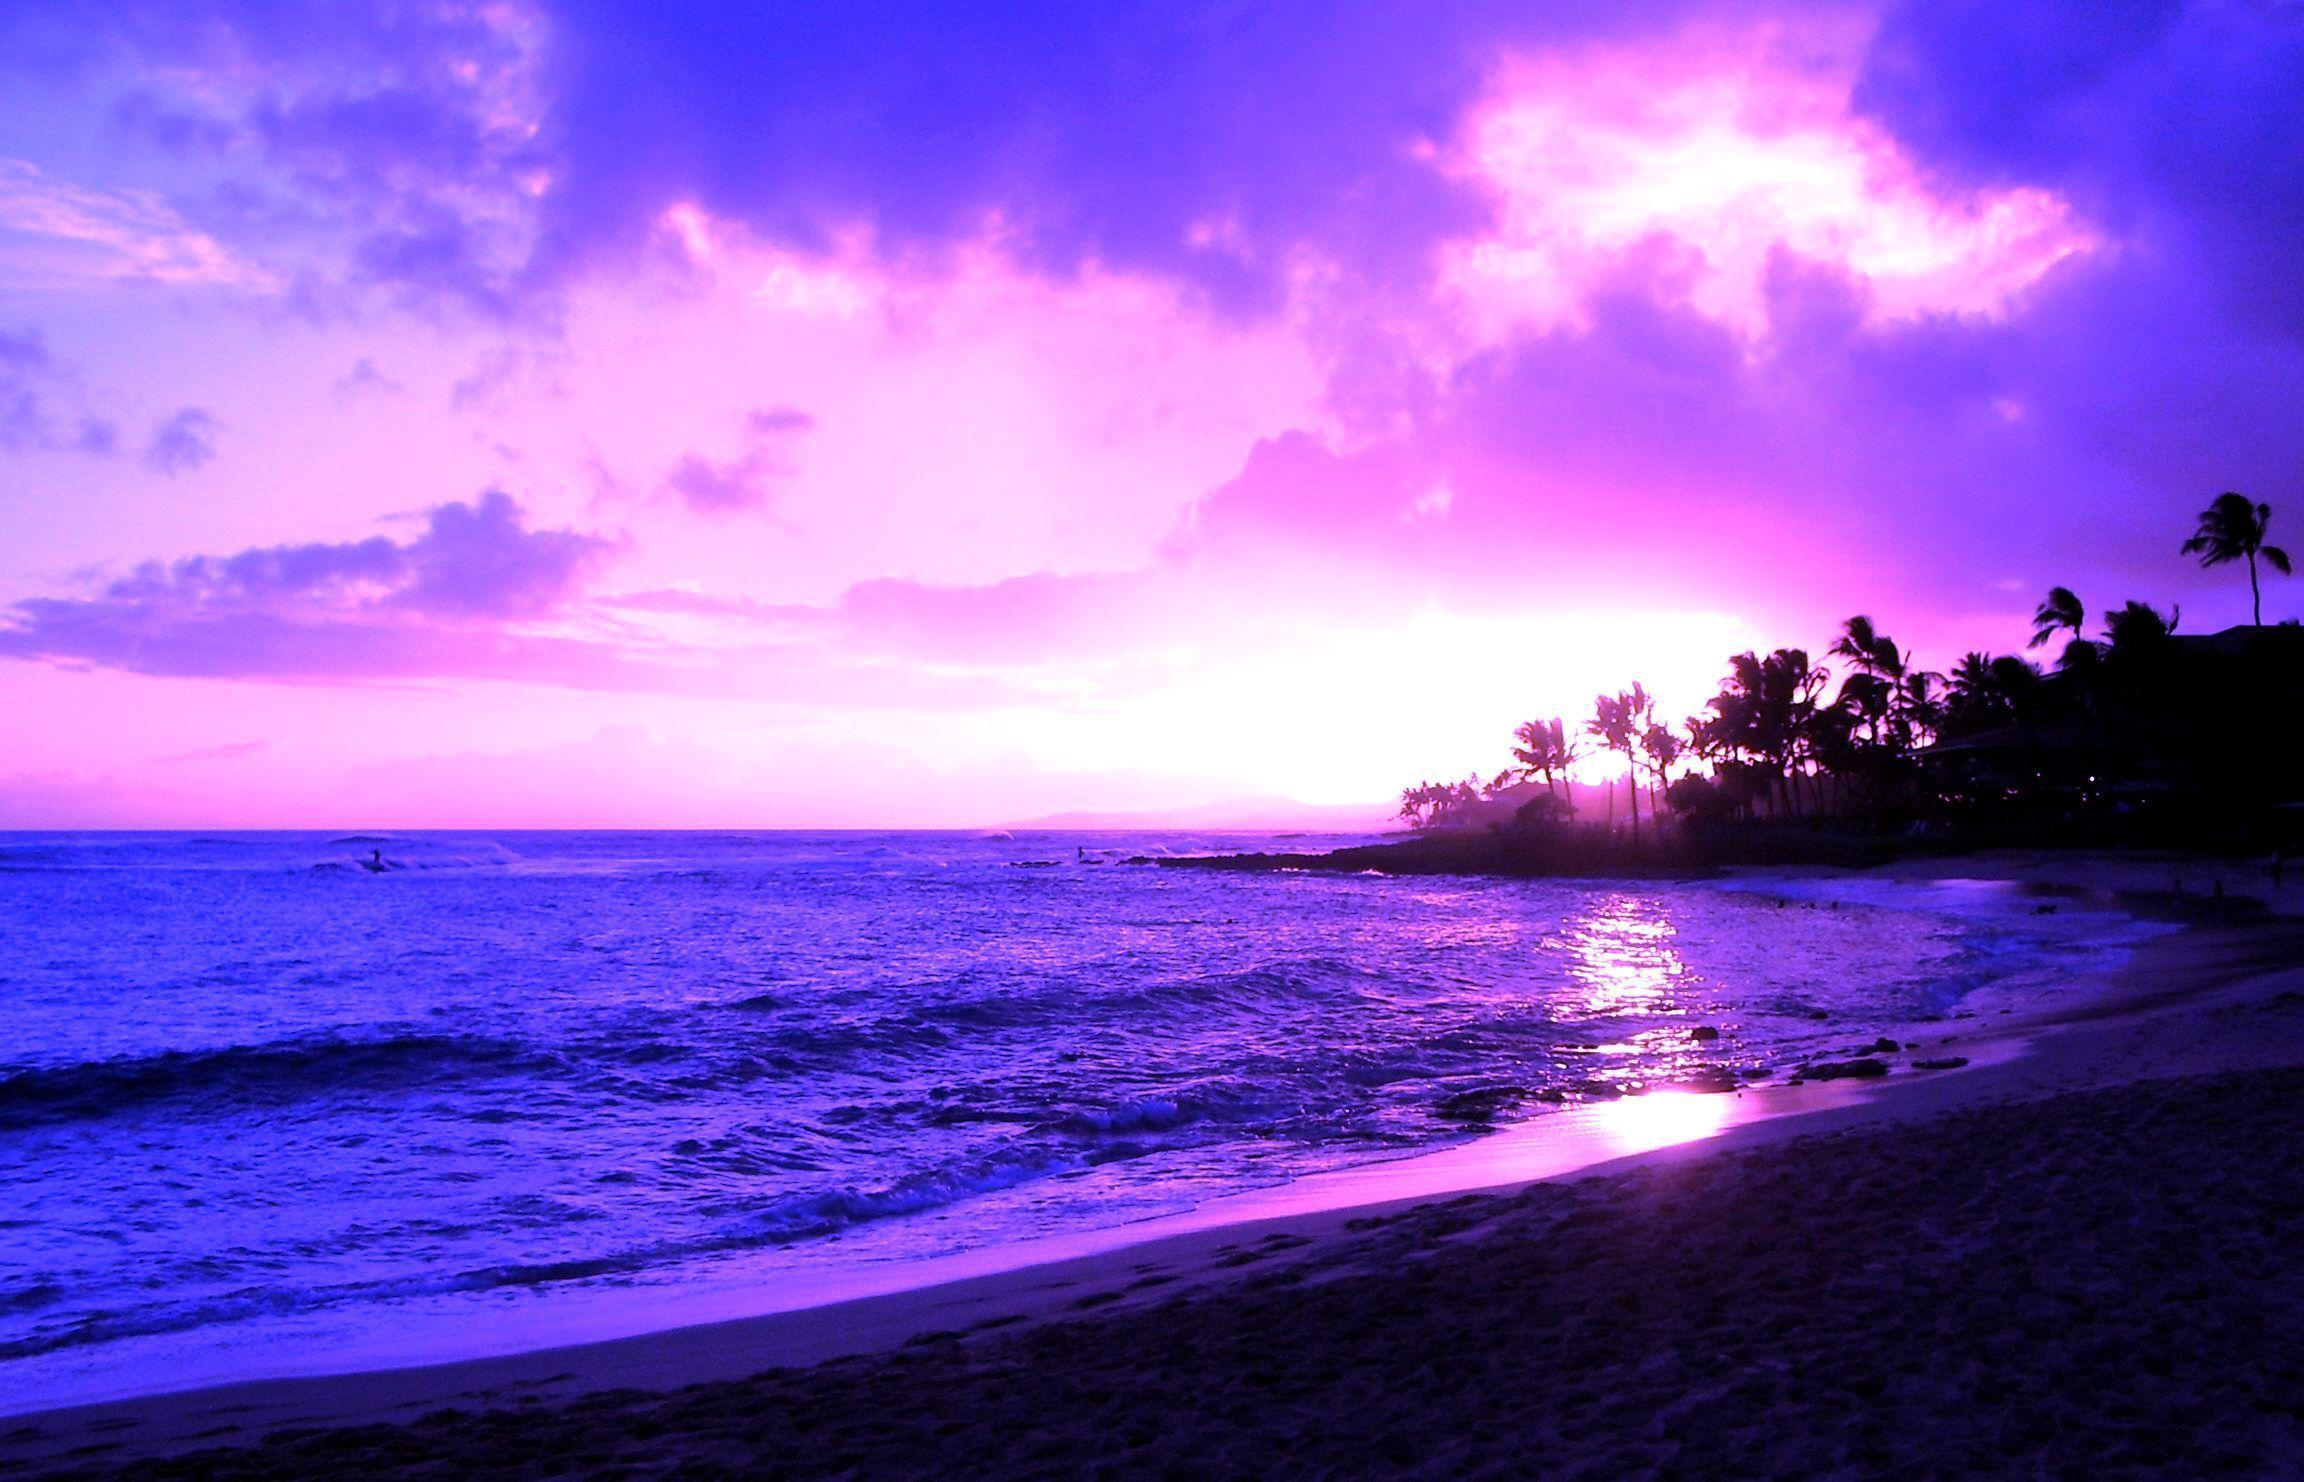 Hawaii Sunset Desktop Backgrounds Related Keywords 2304x1482